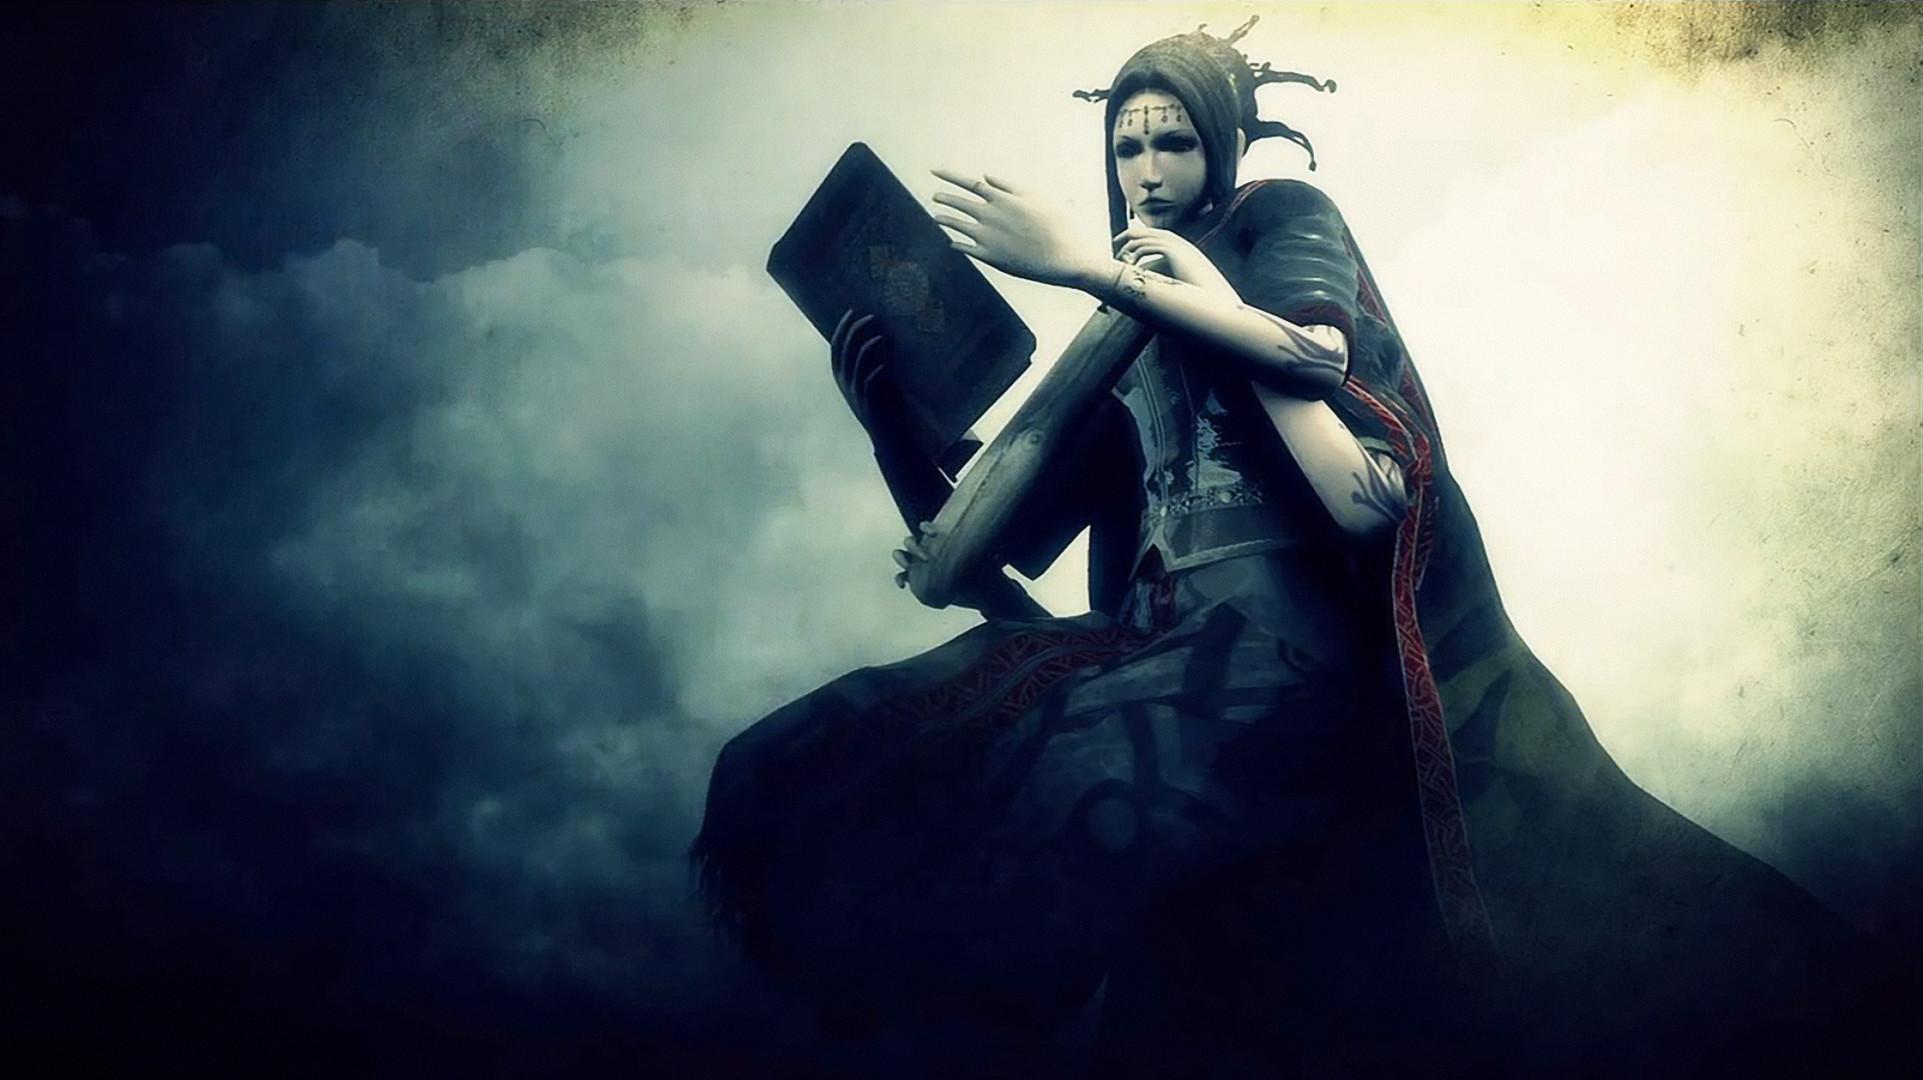 Free demons souls Video Game wallpaper background